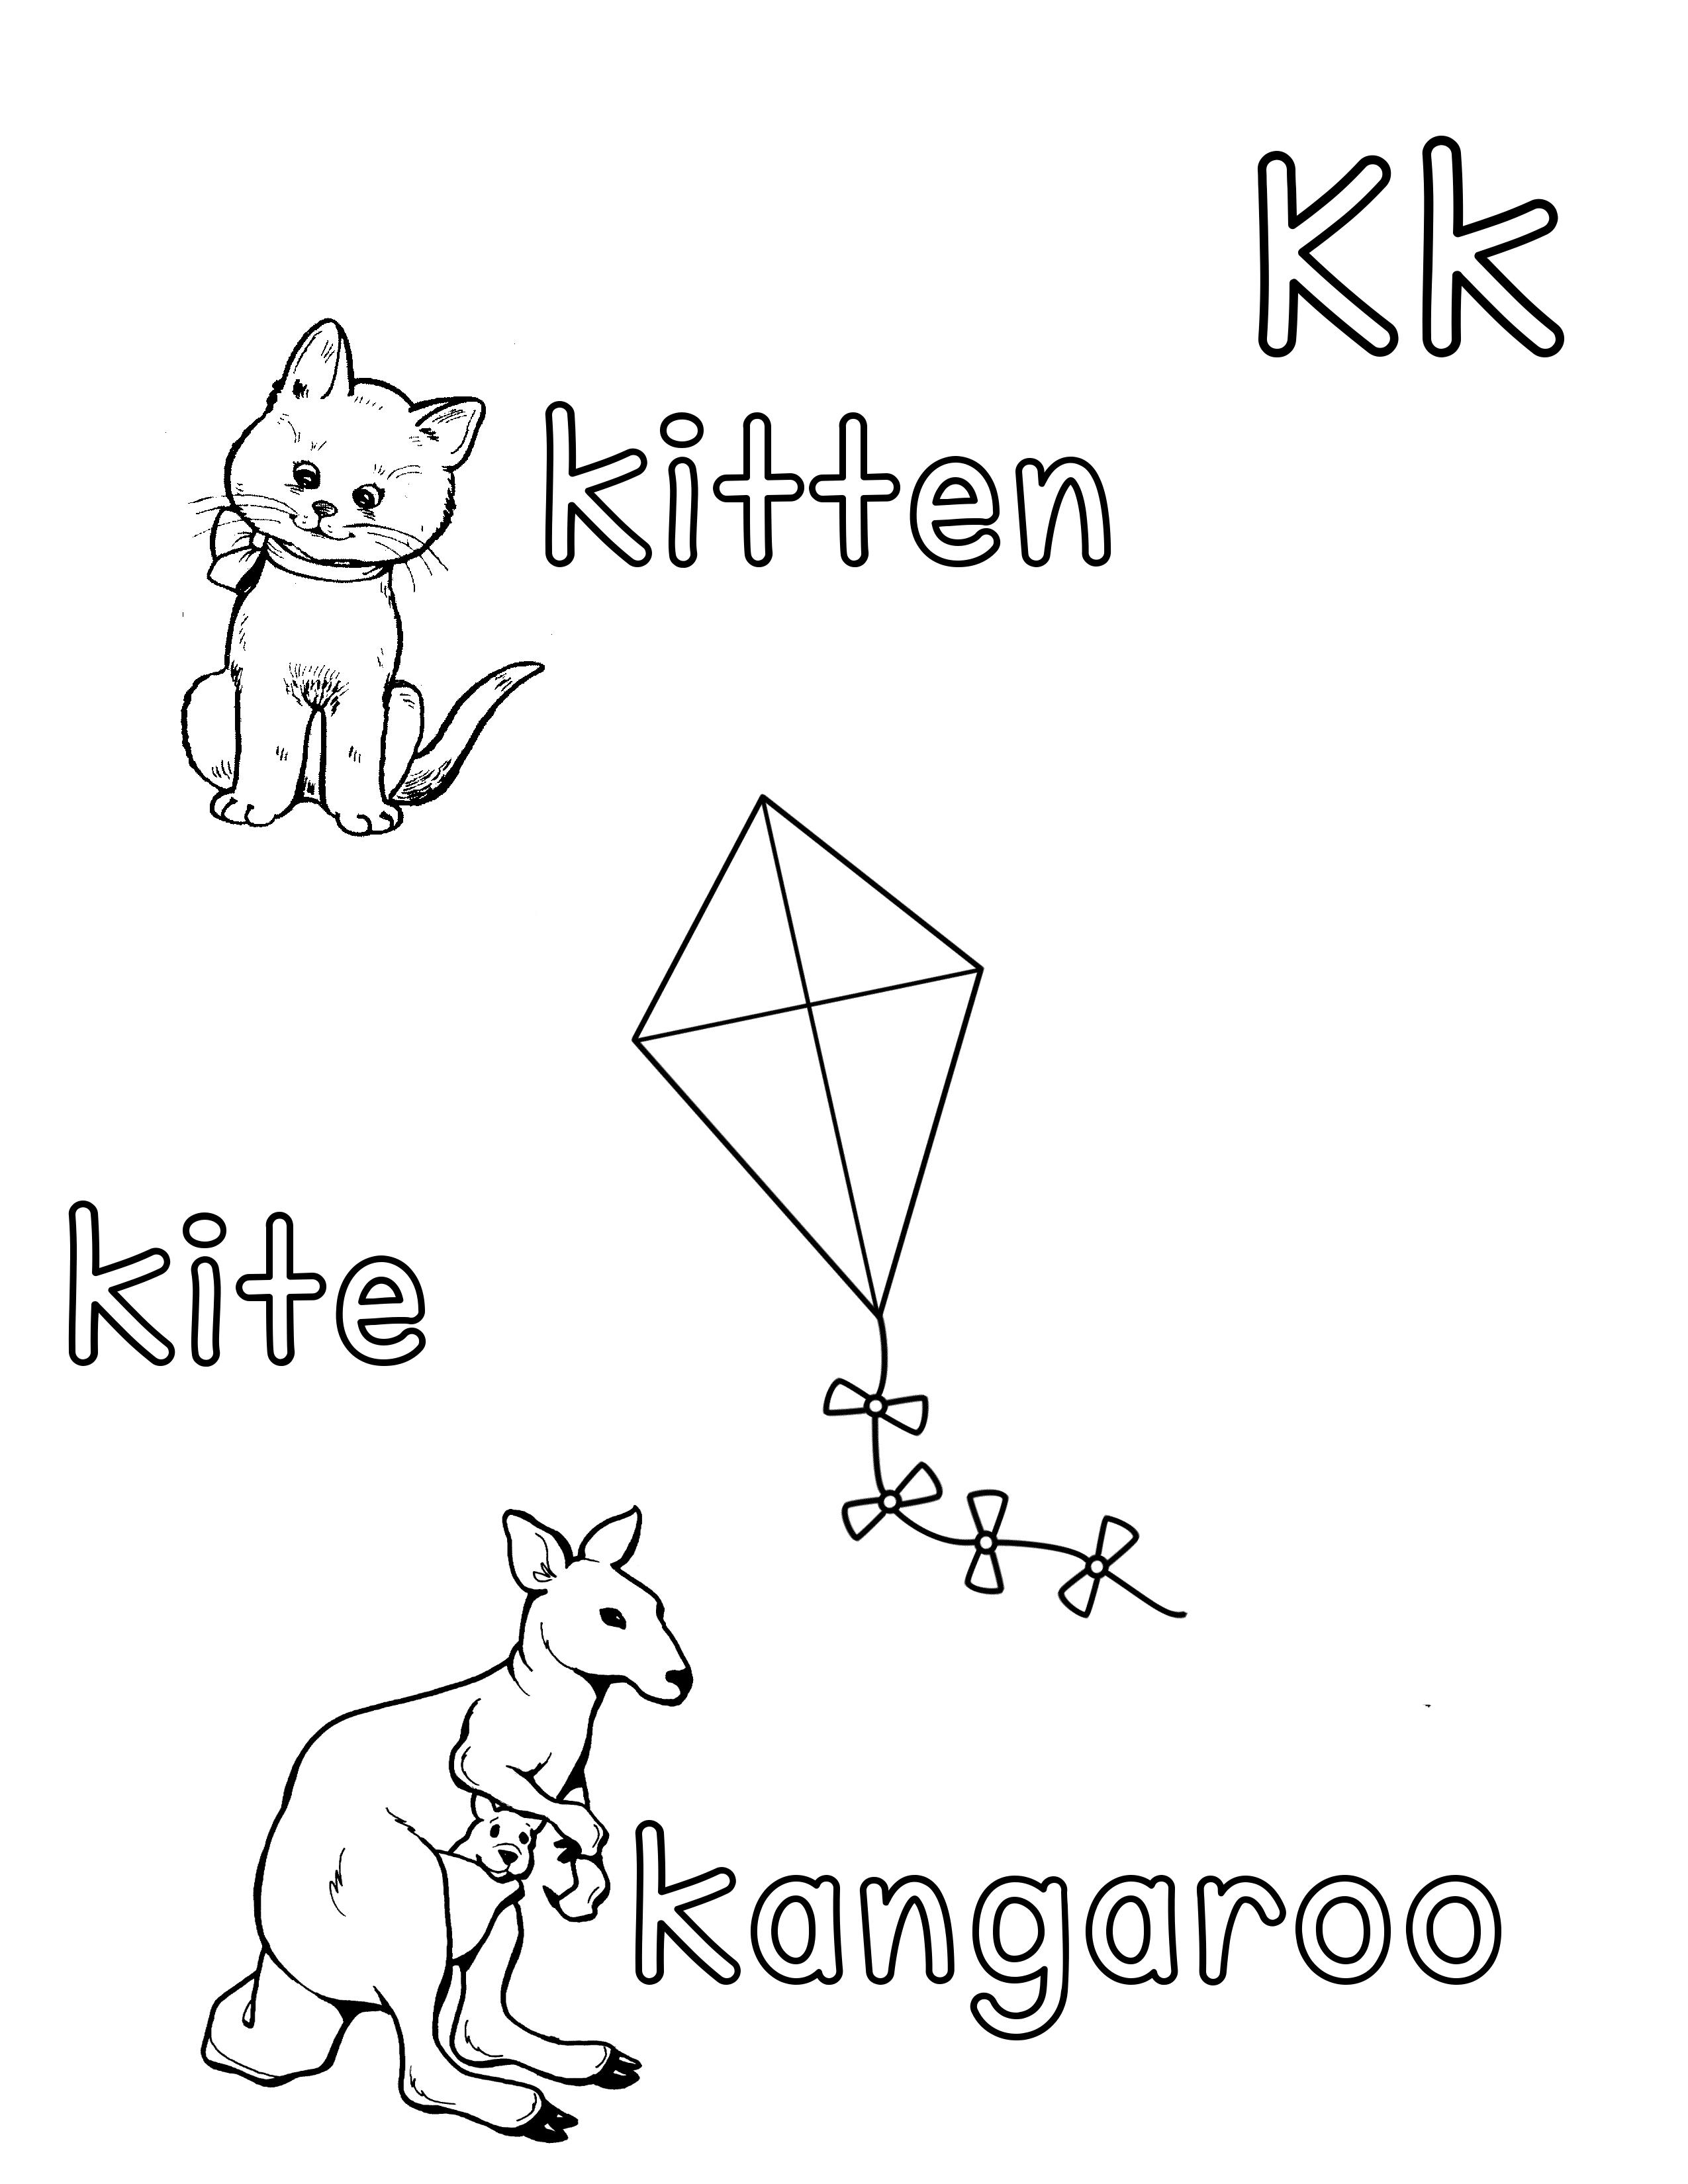 Phonetic Kk Coloring Sheet